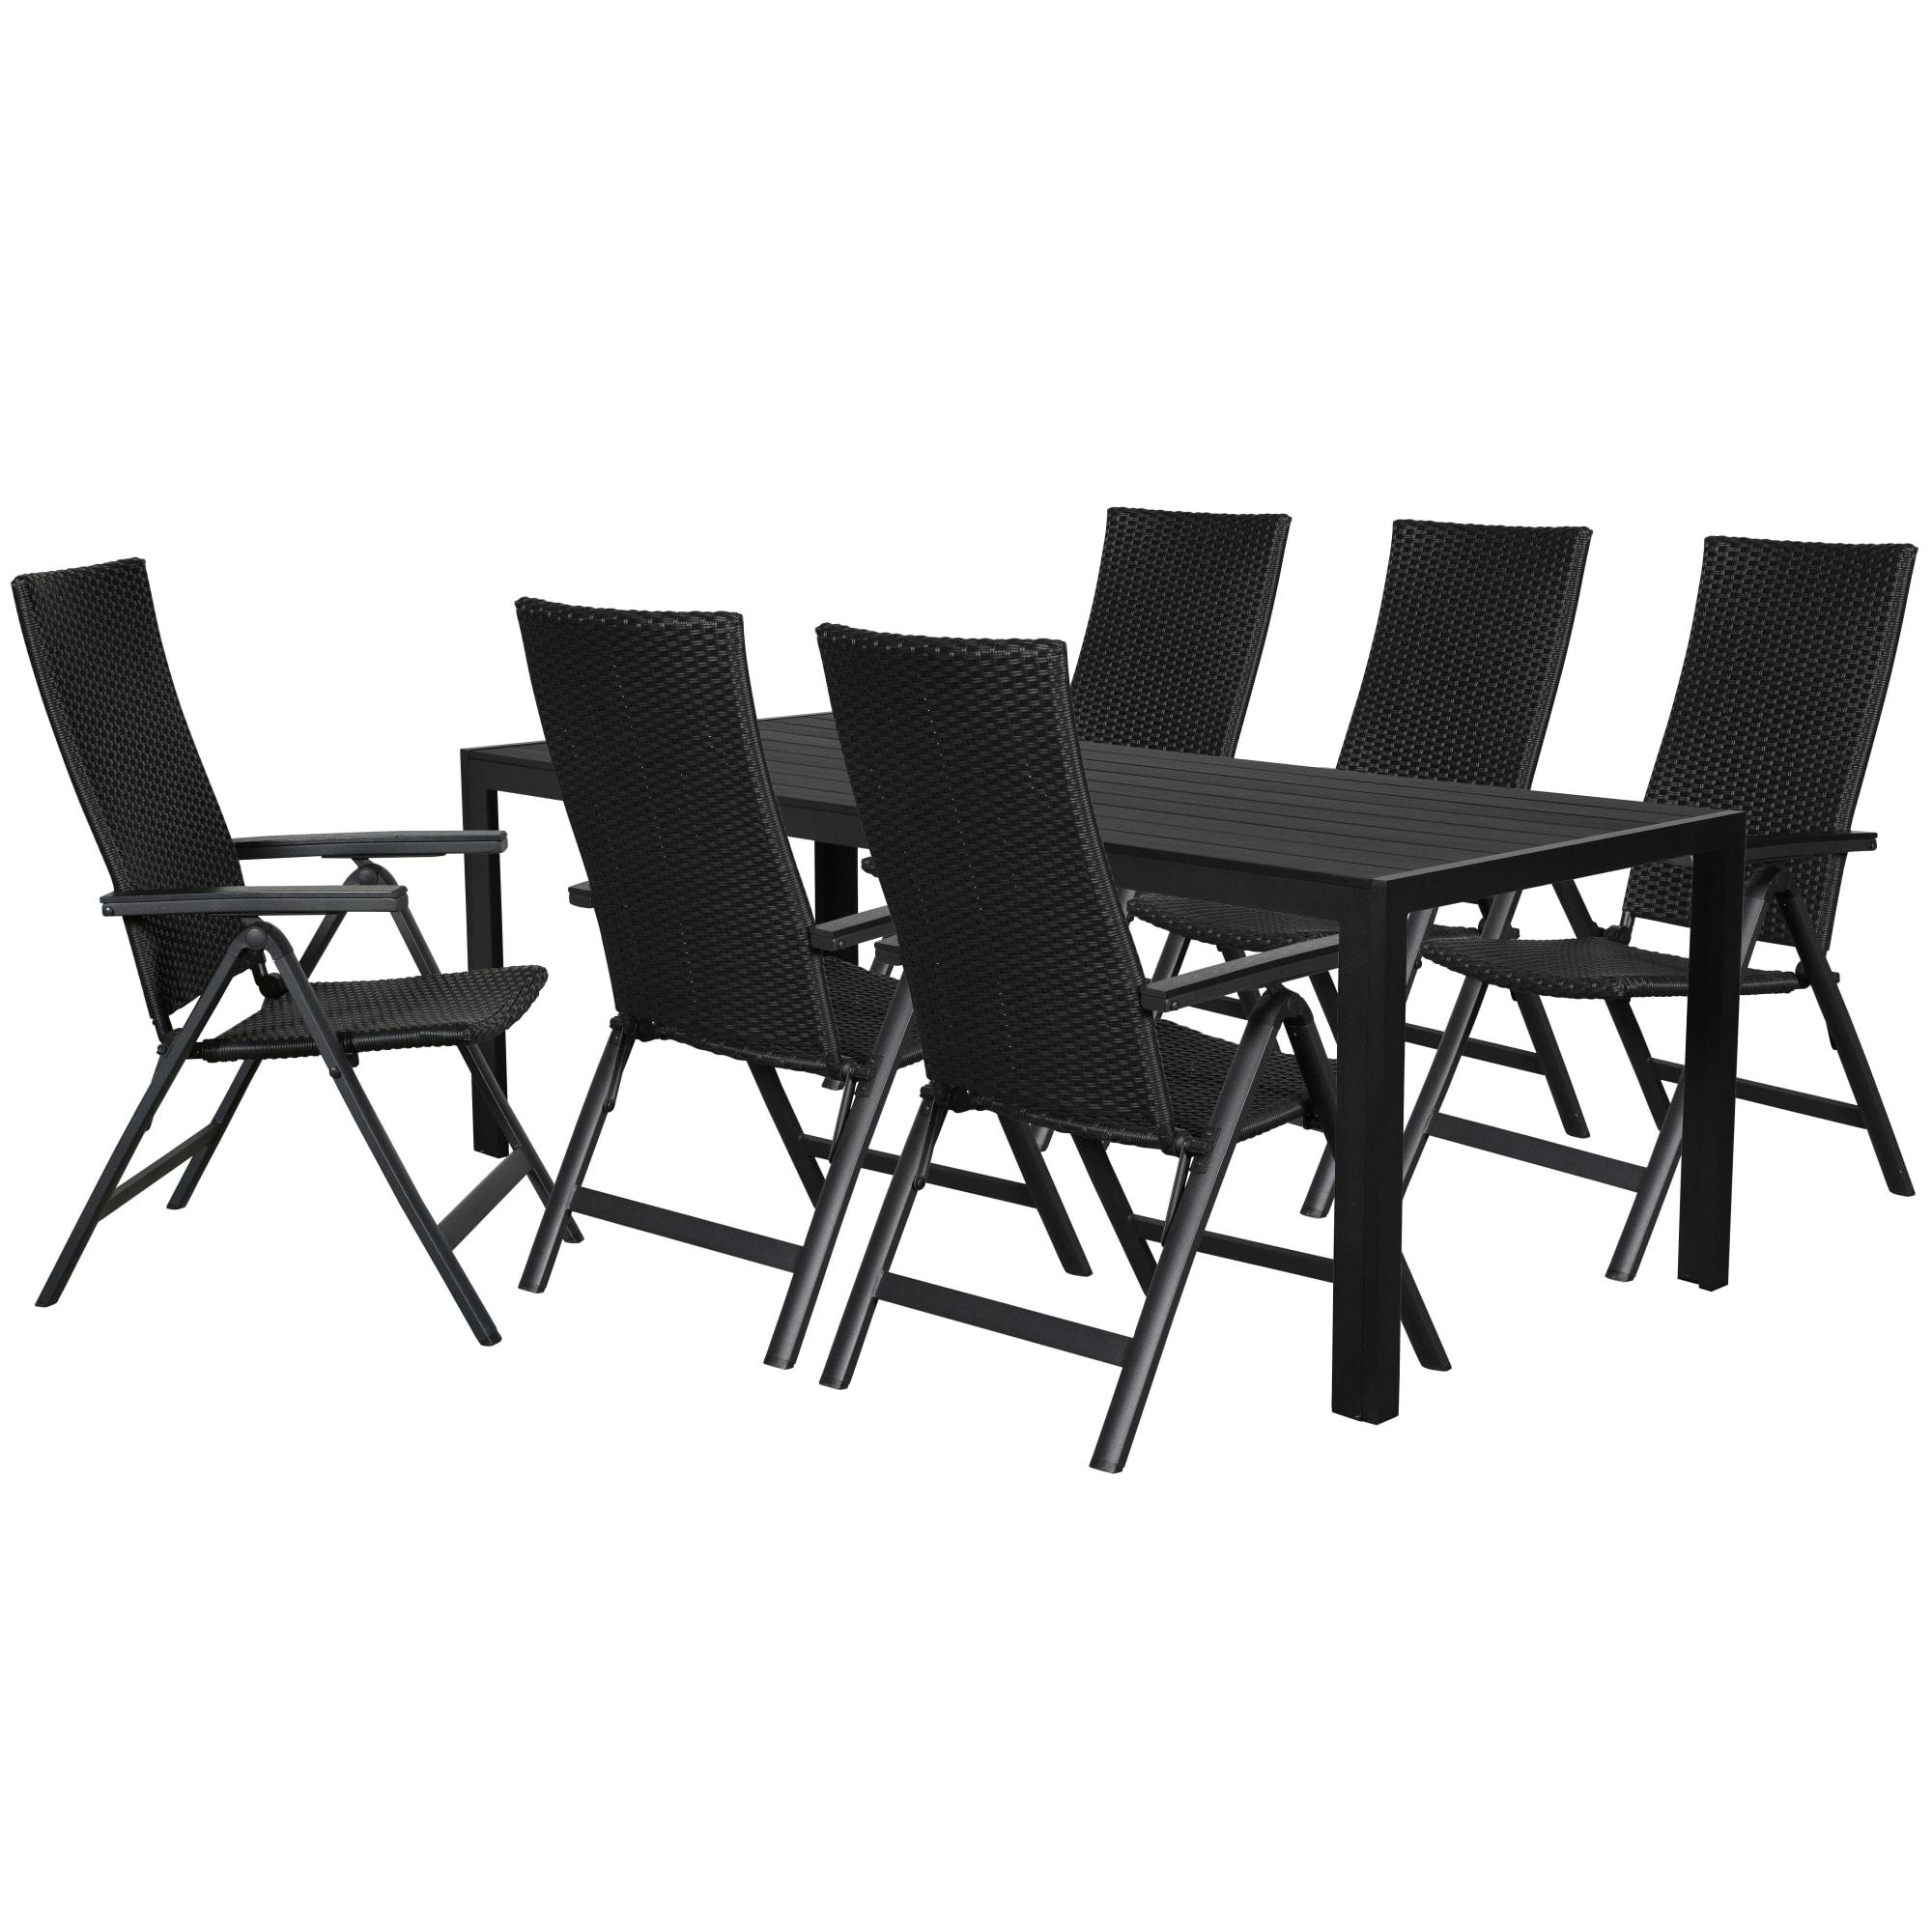 Bord (L 205 cm) og positionsstole